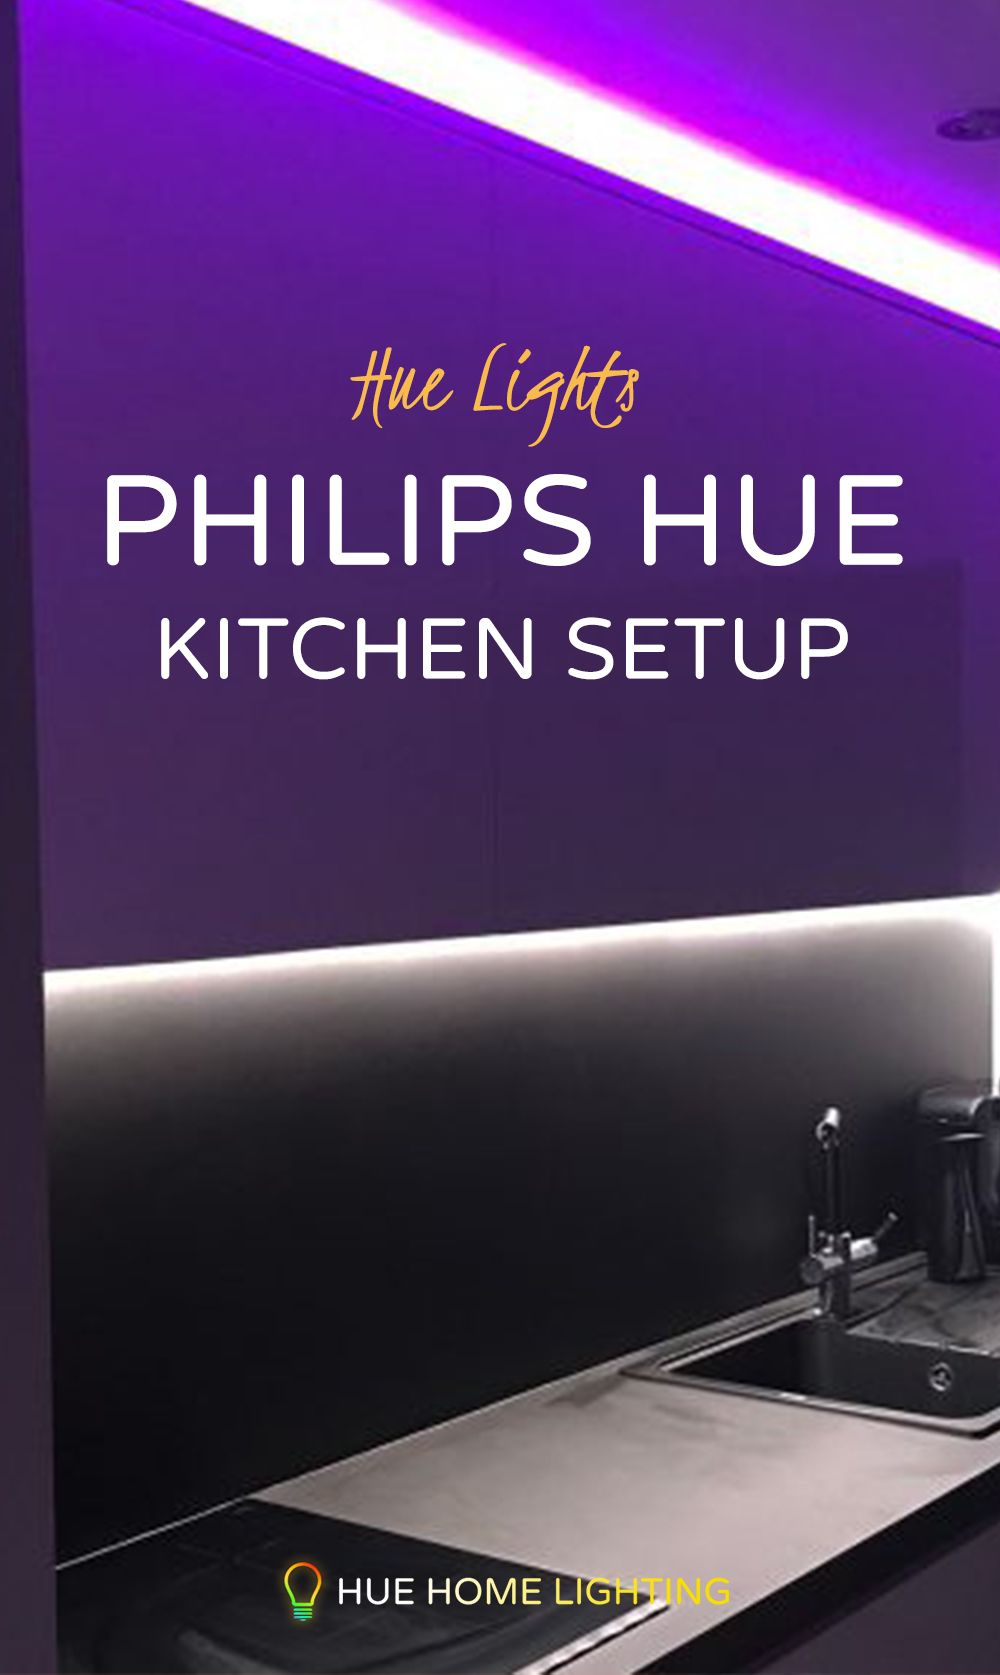 philips hue light strip ideas on hue strip lights in the kitchen hue philips hue lights strip lighting hue strip lights in the kitchen hue